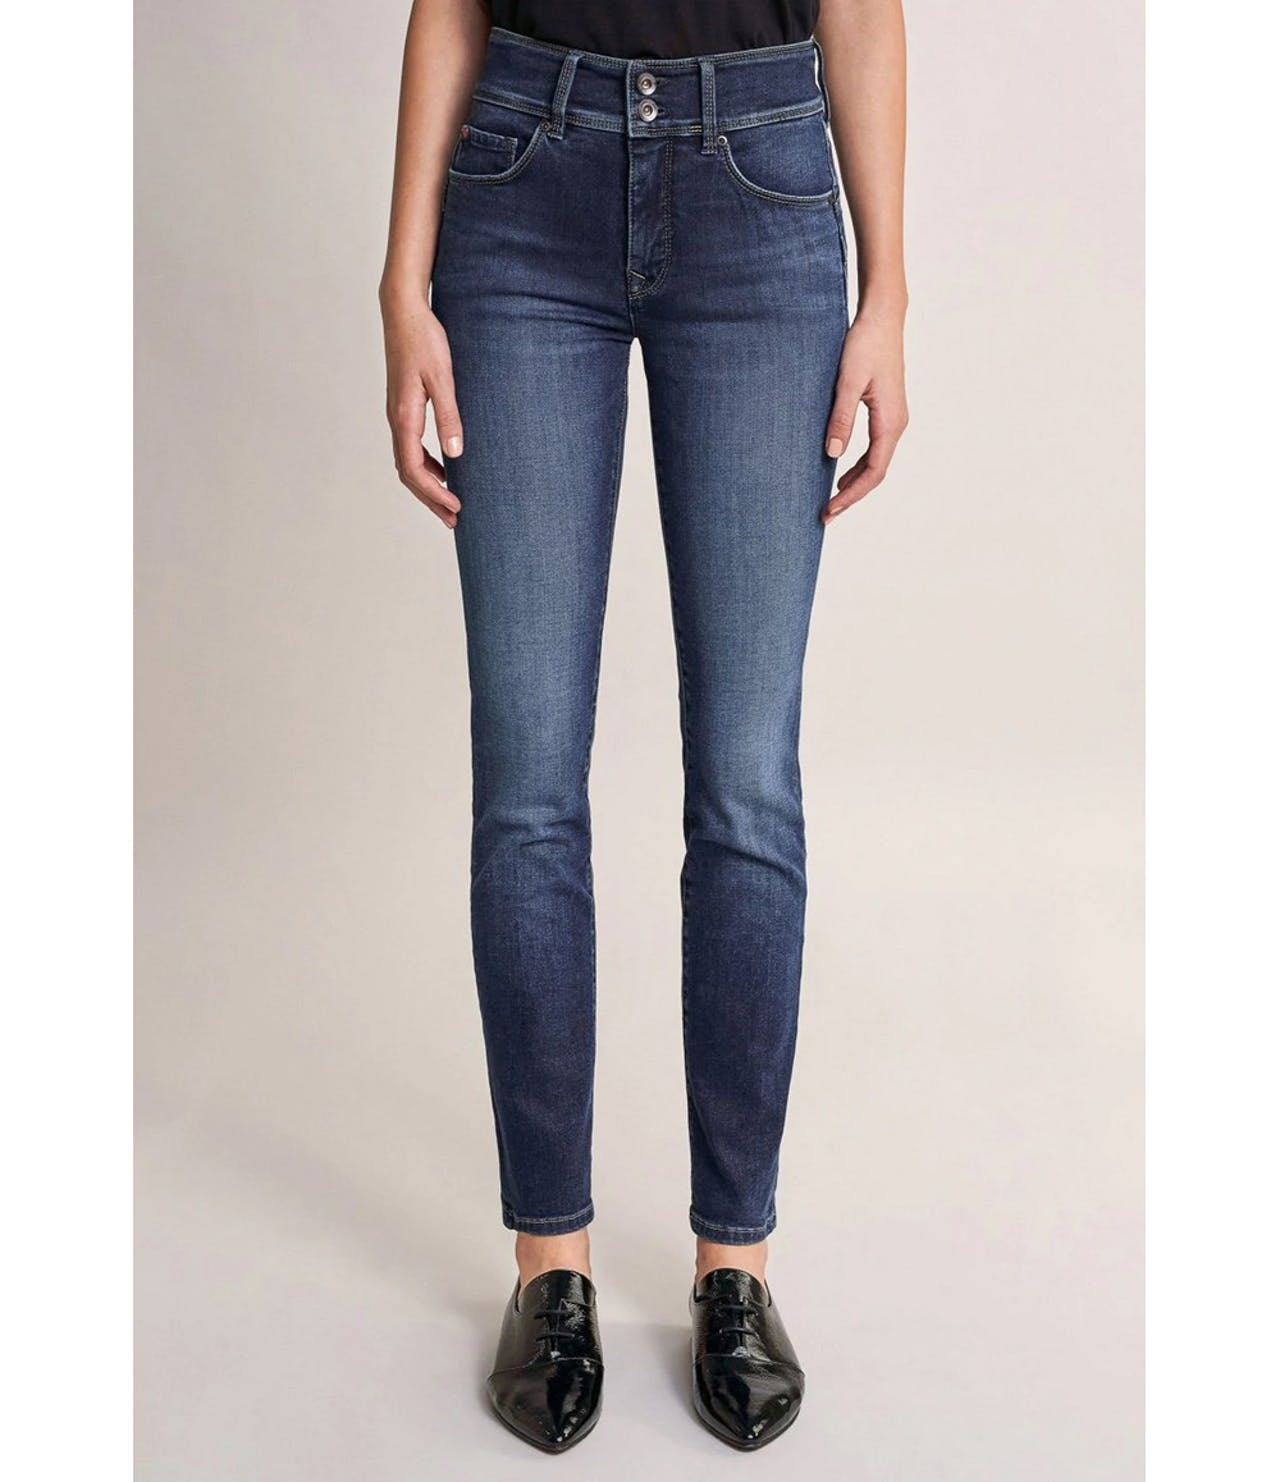 Salsa Jeans 32 Leg Push in Secret Dark Denim Jeans